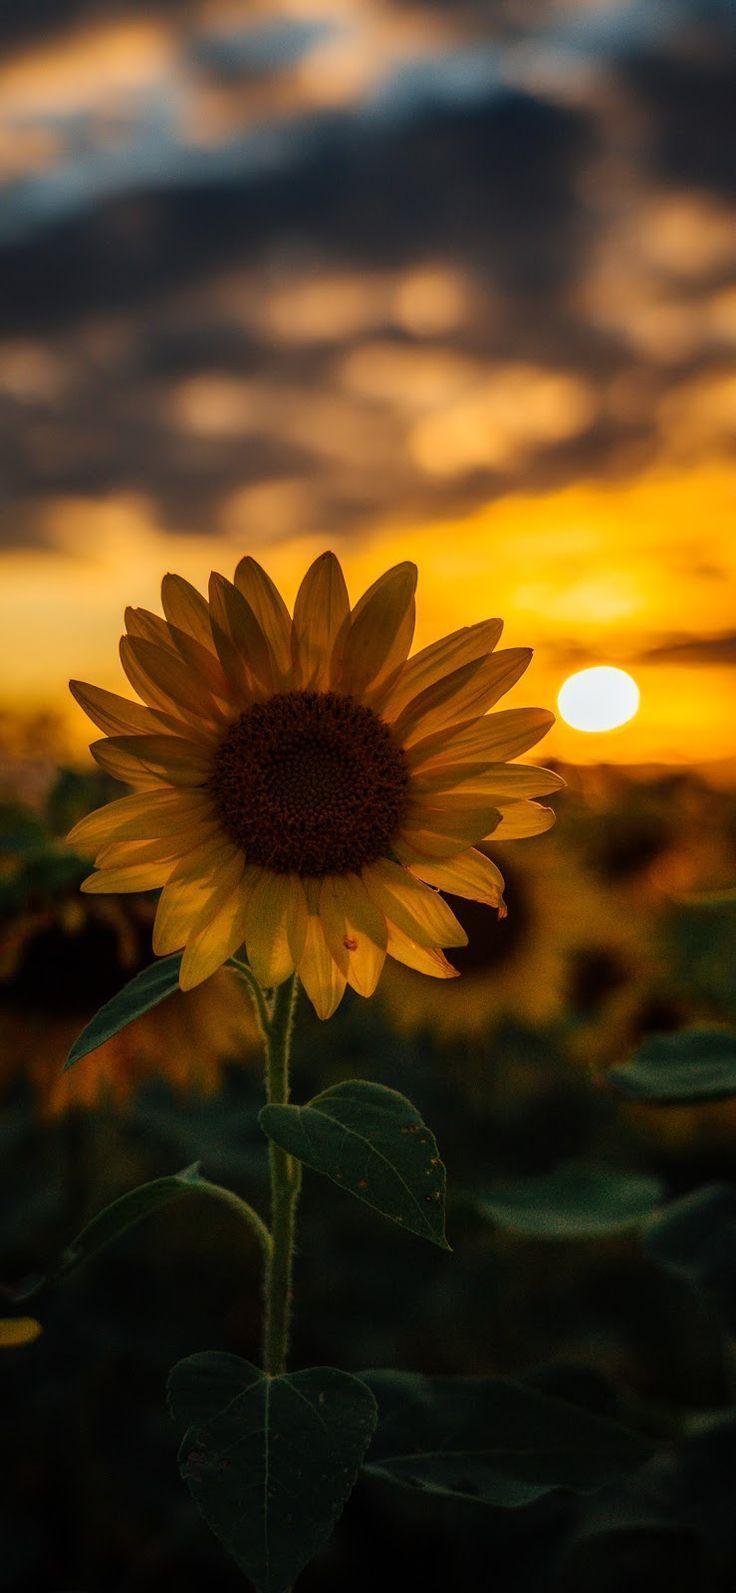 Sunflower Wallpaper Iphone X Iphone Sunflower Wallpaper Click Here To 4k 2020 Iphone Arkaplanlari Arka Planlar Manzara Fotografciligi